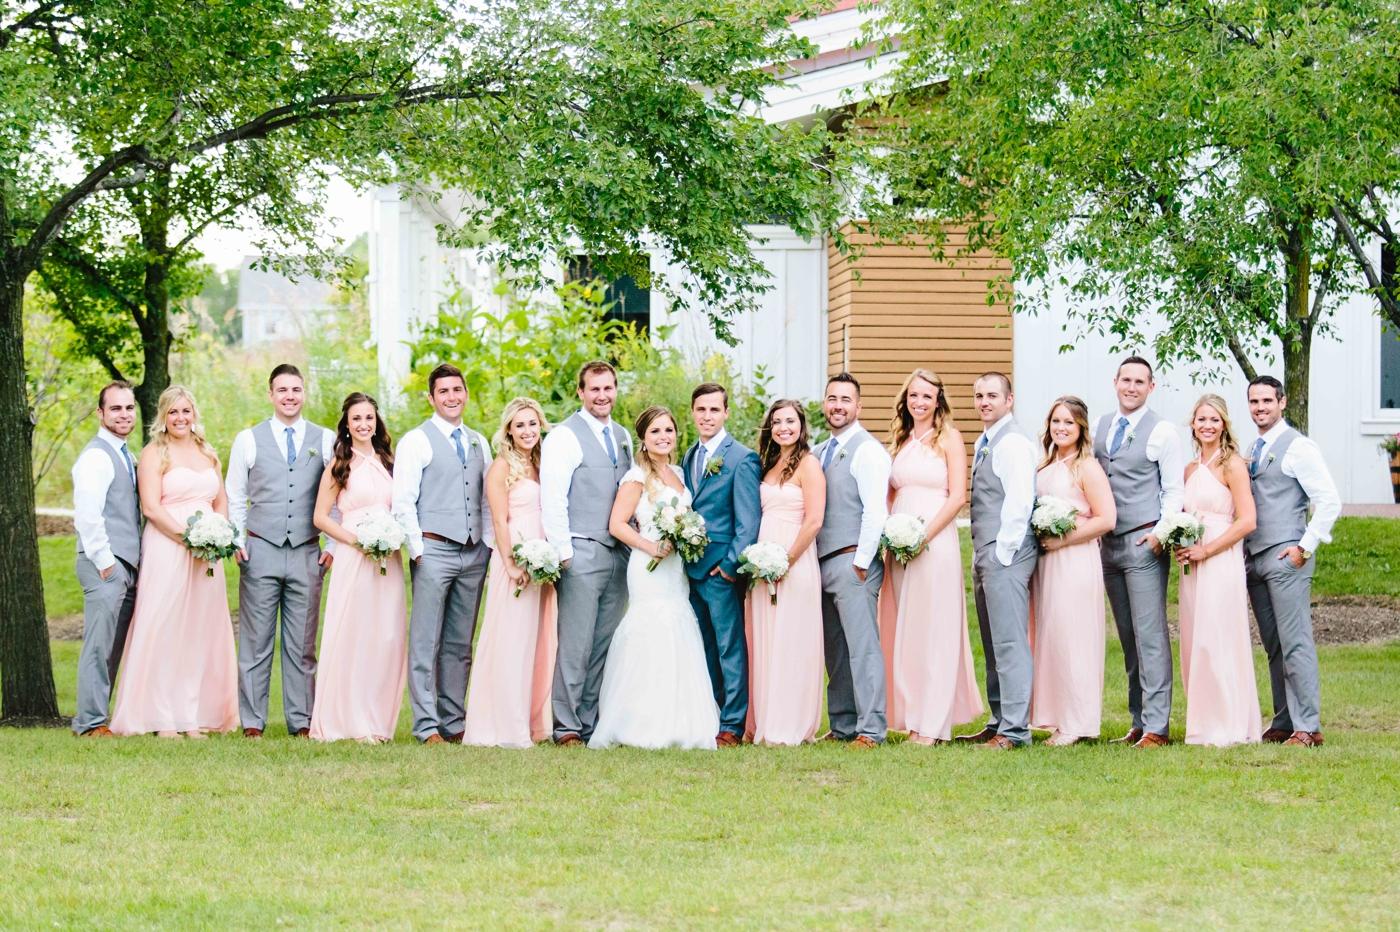 chicago-fine-art-wedding-photography-chiapetta33